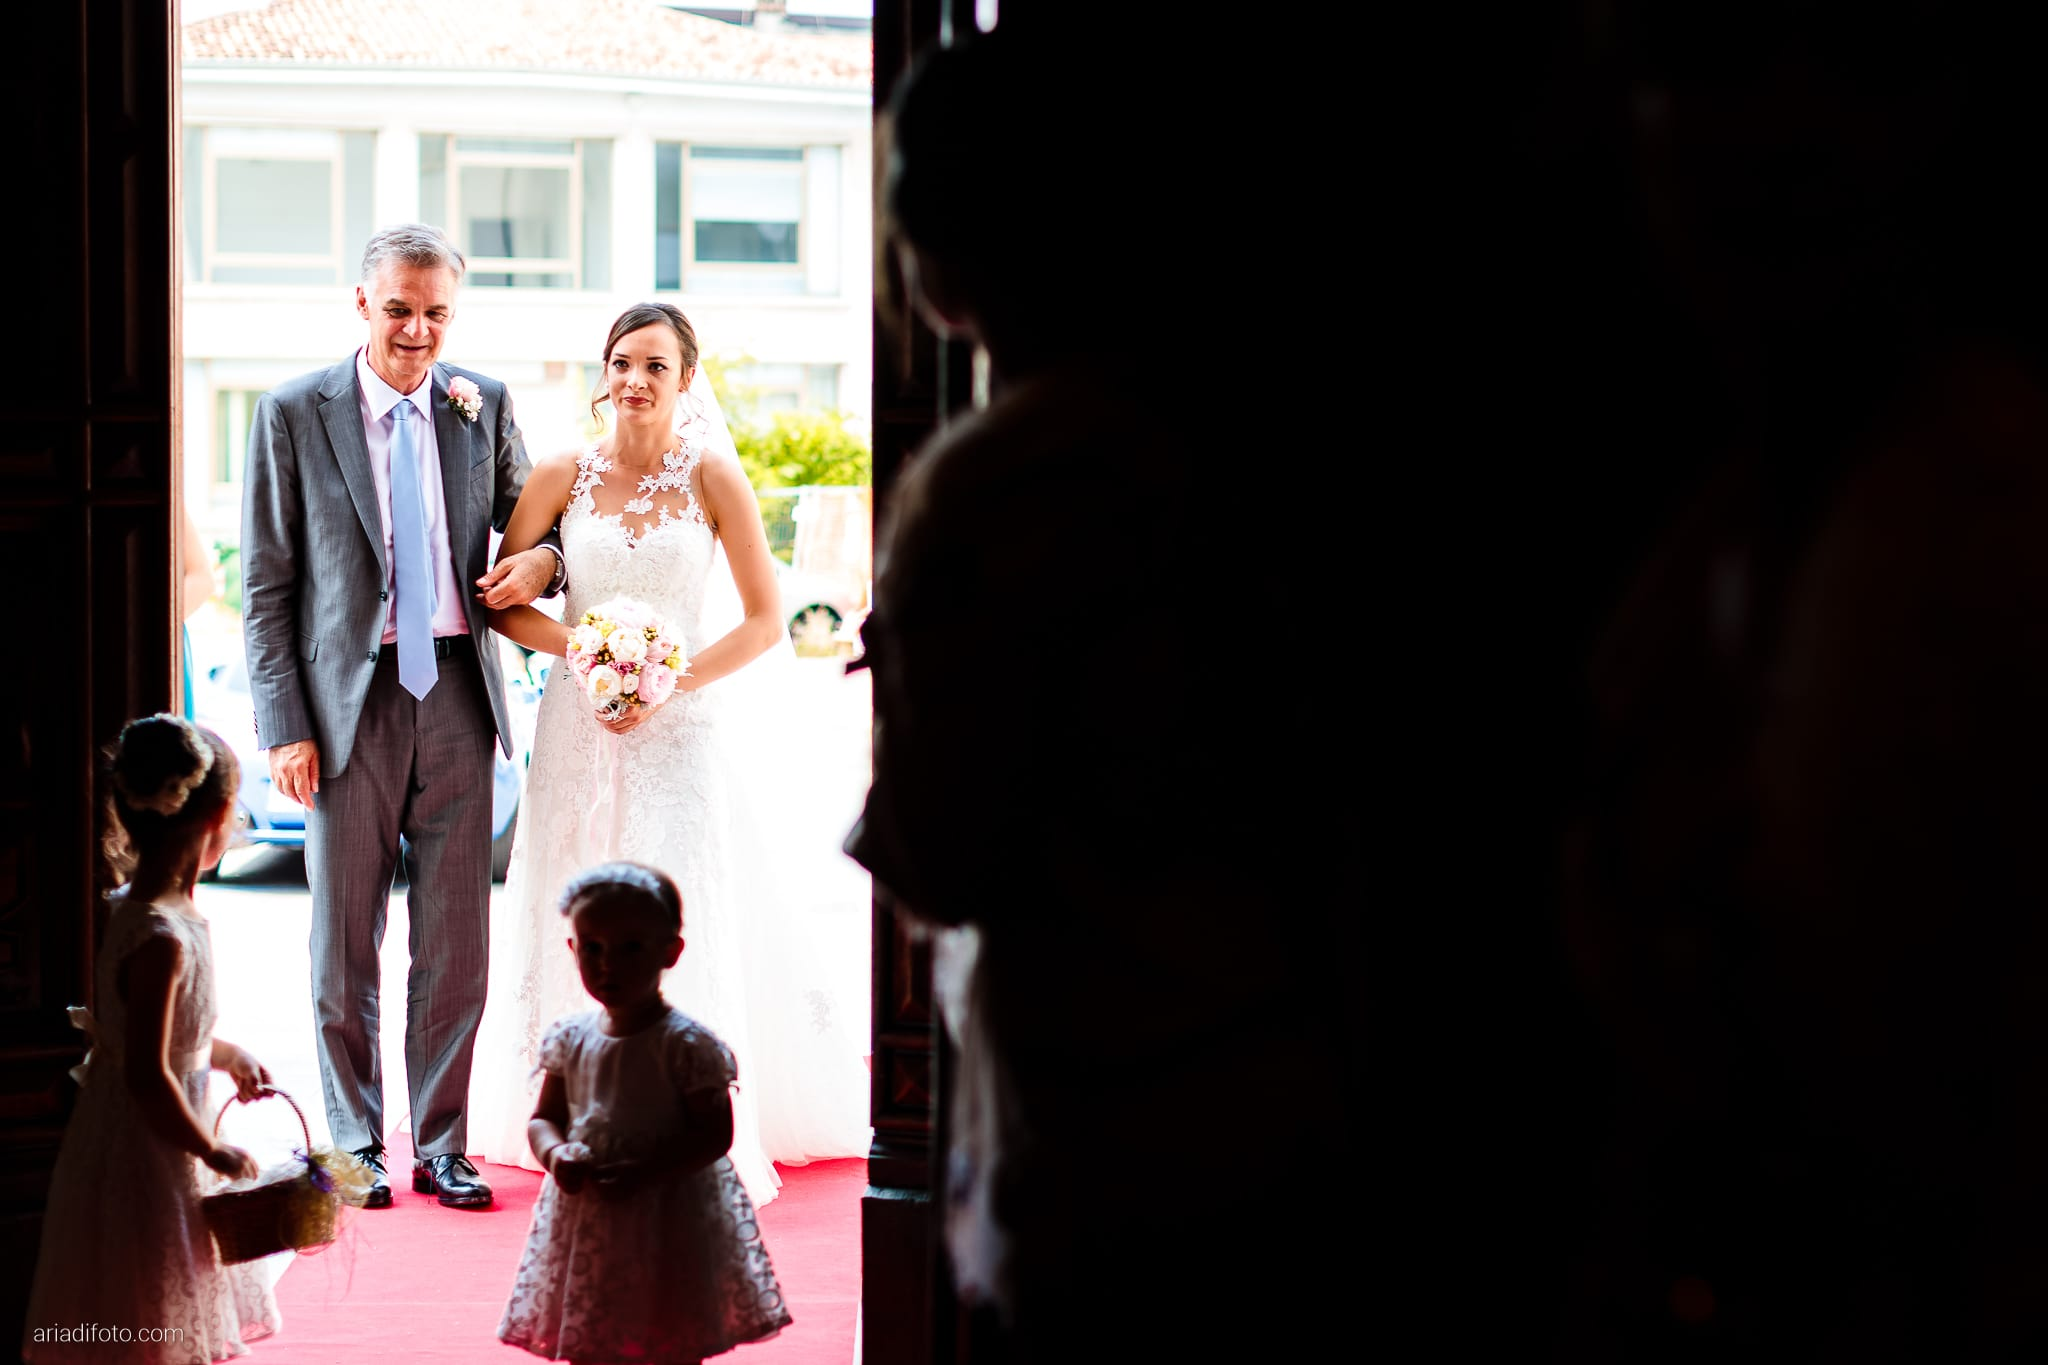 Valentina Marco Matrimonio Duomo Gorizia Castelvecchio Sagrado cerimonia cattolica ingresso sposa